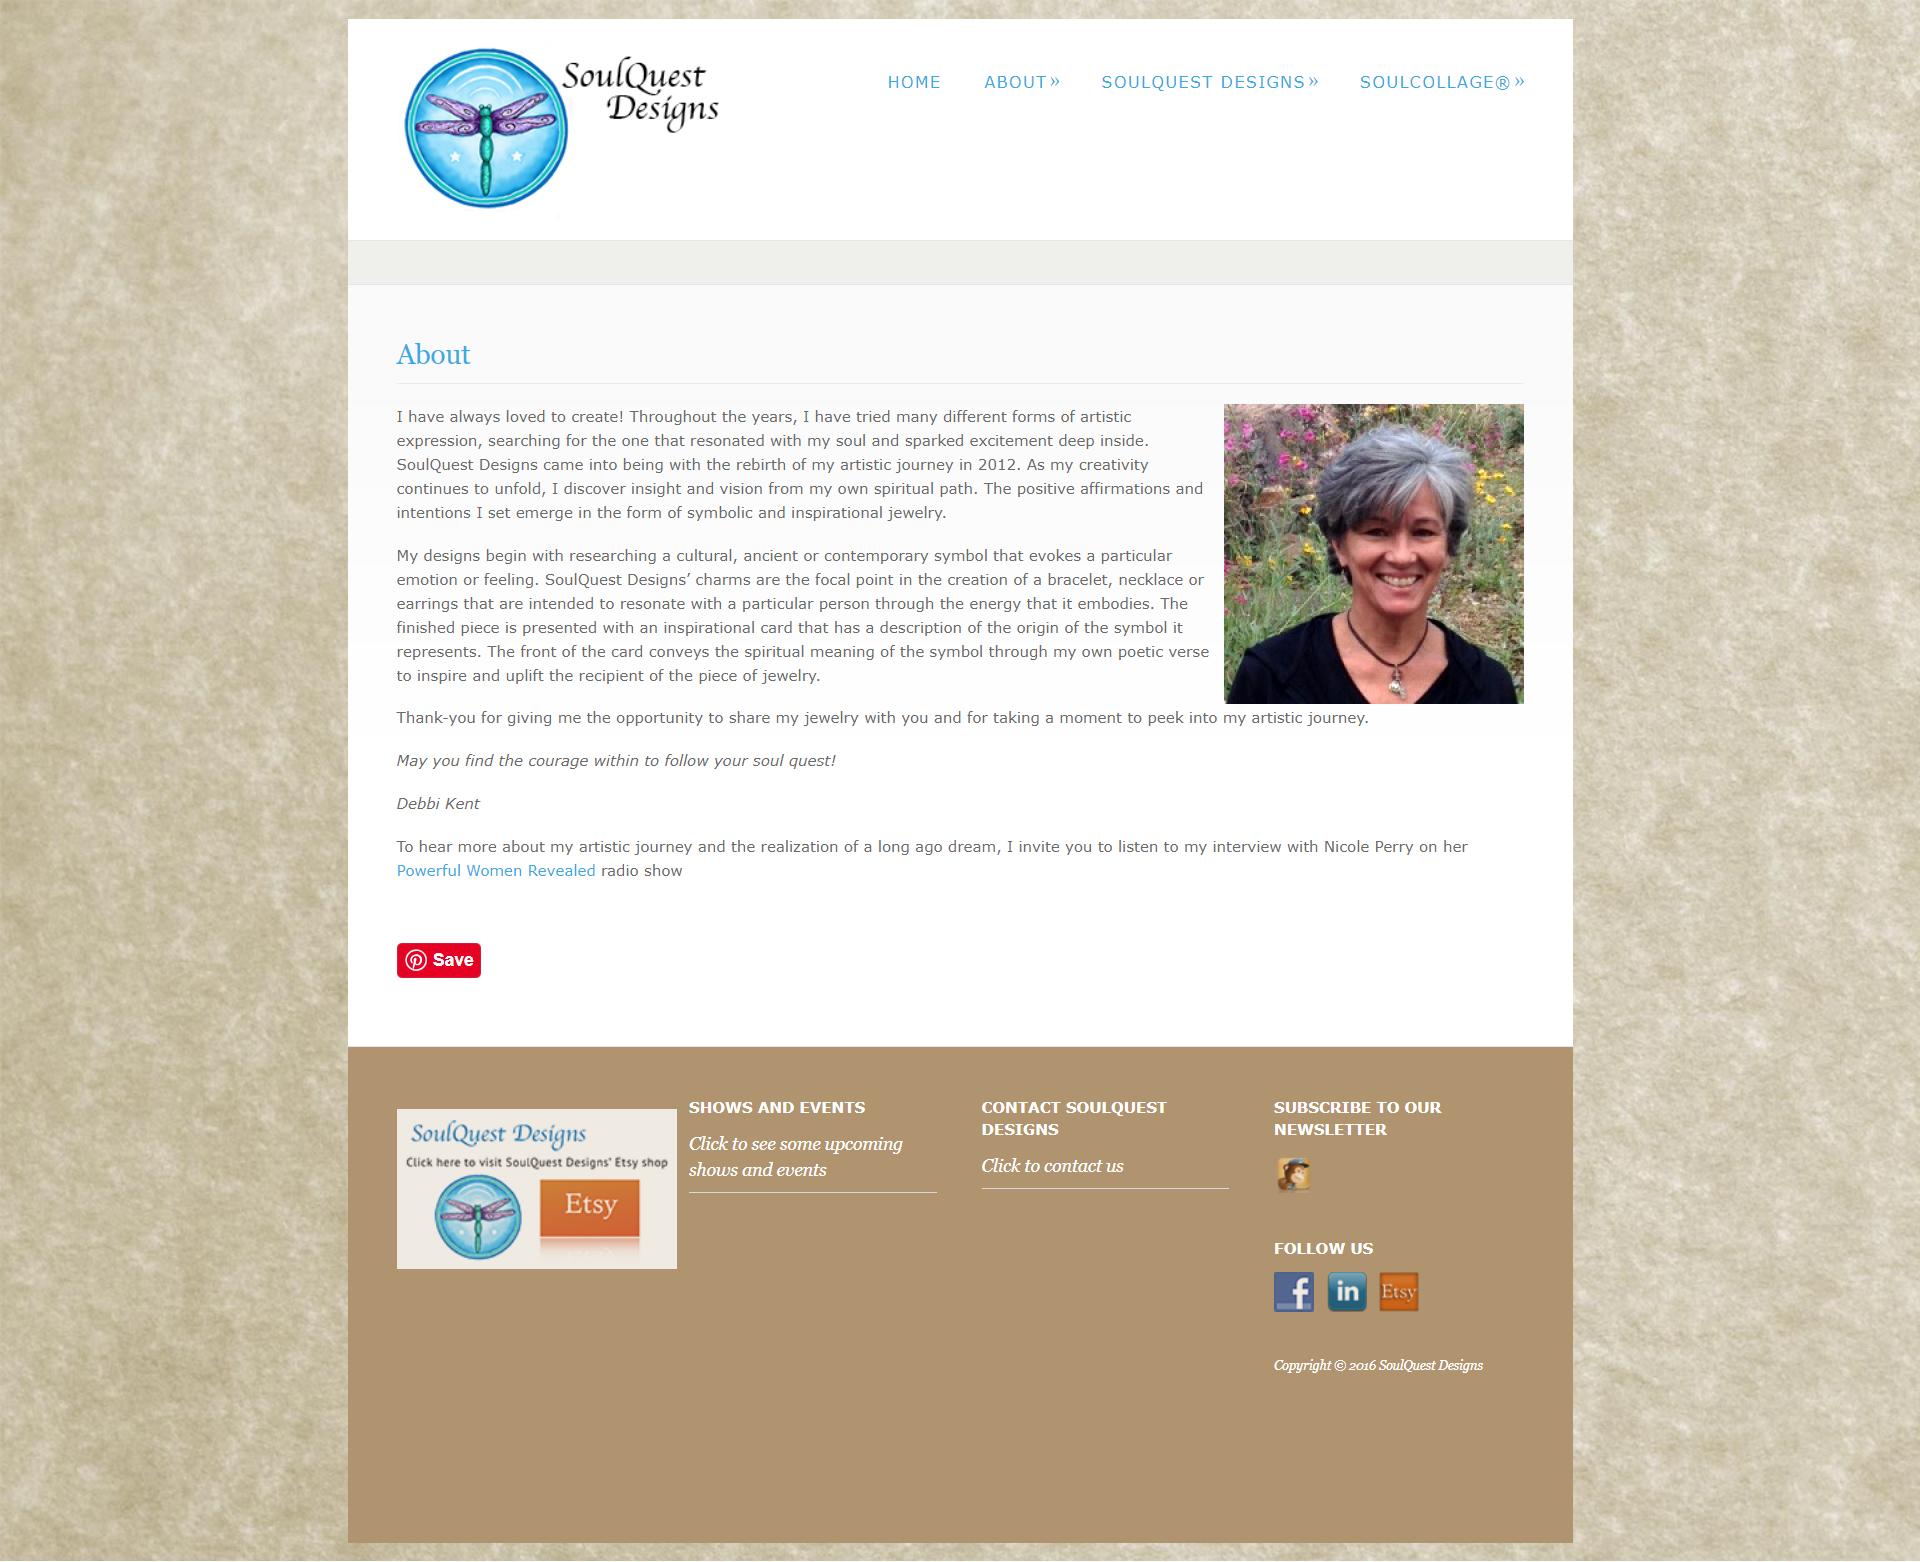 Kristen Leigh | WordPress Web Design Studio | SoulQuest Designs Portfolio Piece | About Page Before the Redesign